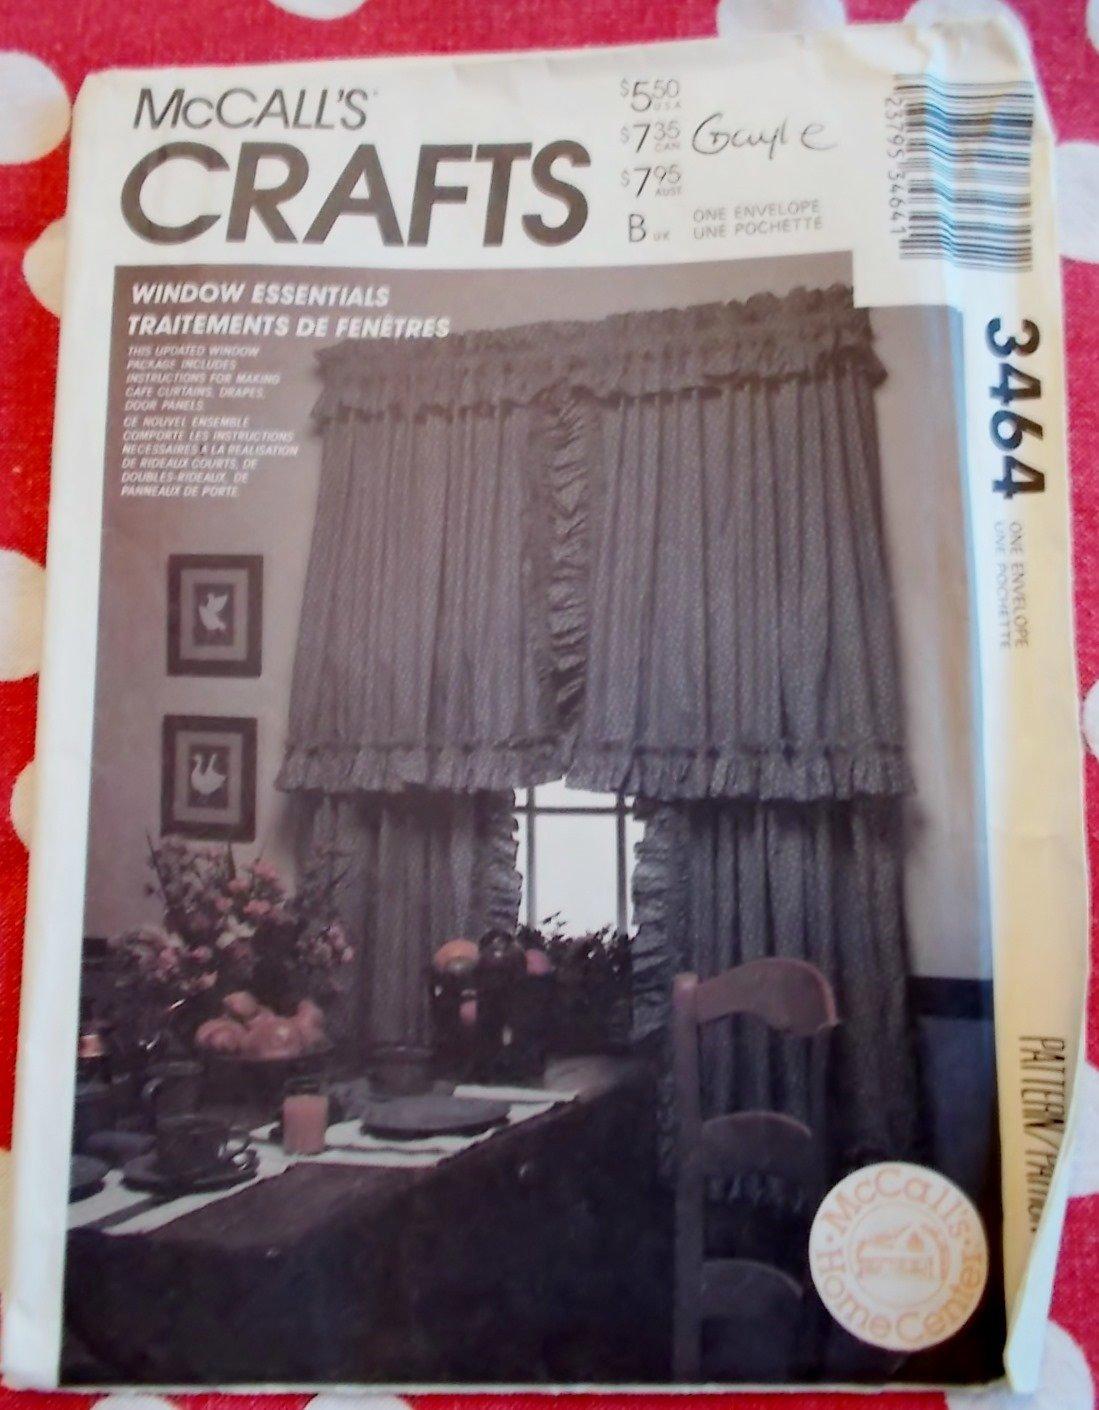 Windows Essentials Curtains & Drapes, McCalls 3464 Pattern,